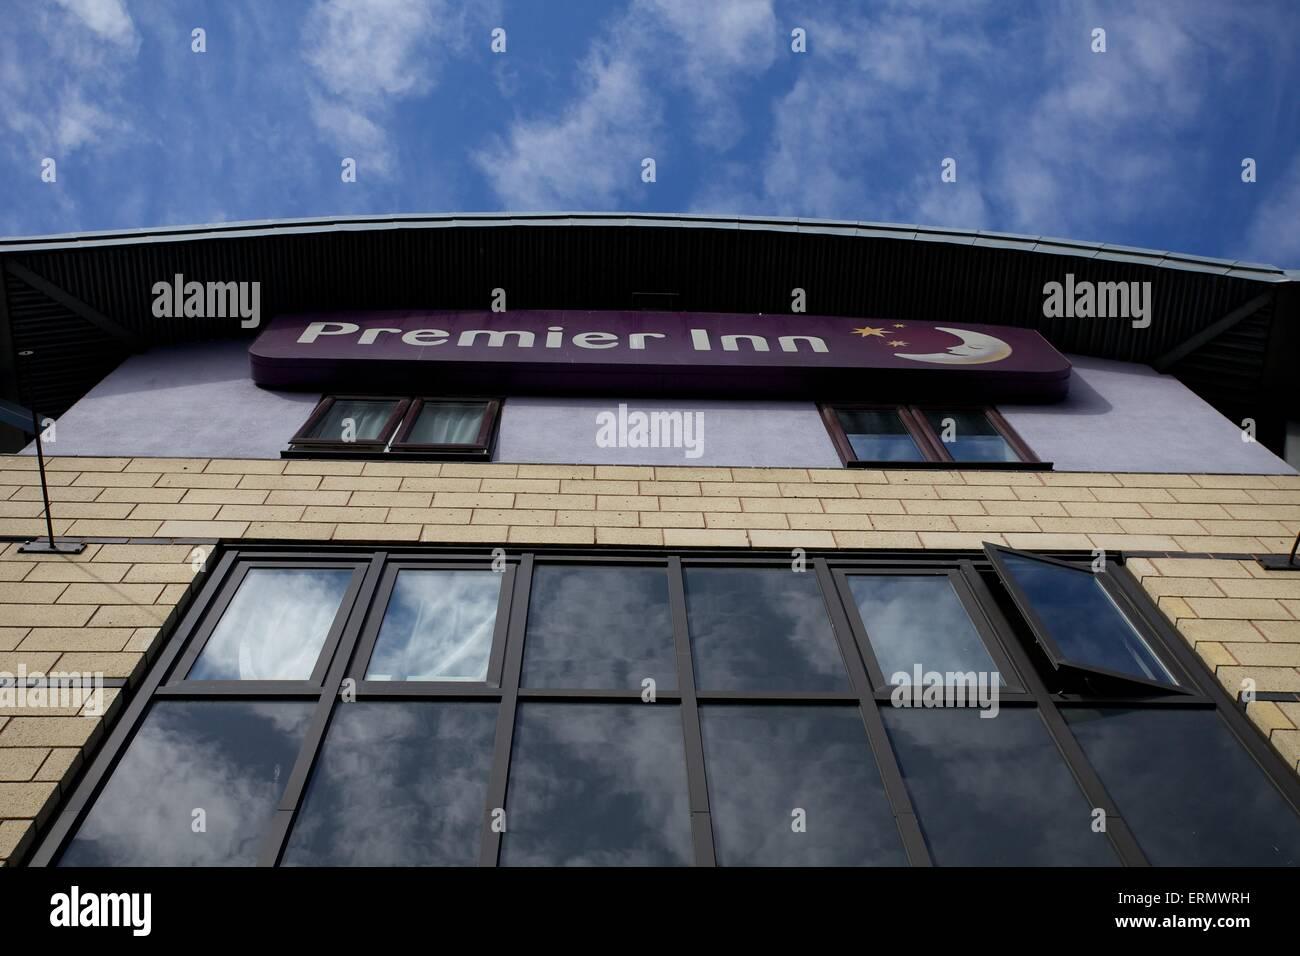 Außenaufnahme des Premier Inn in Leeds Stockbild